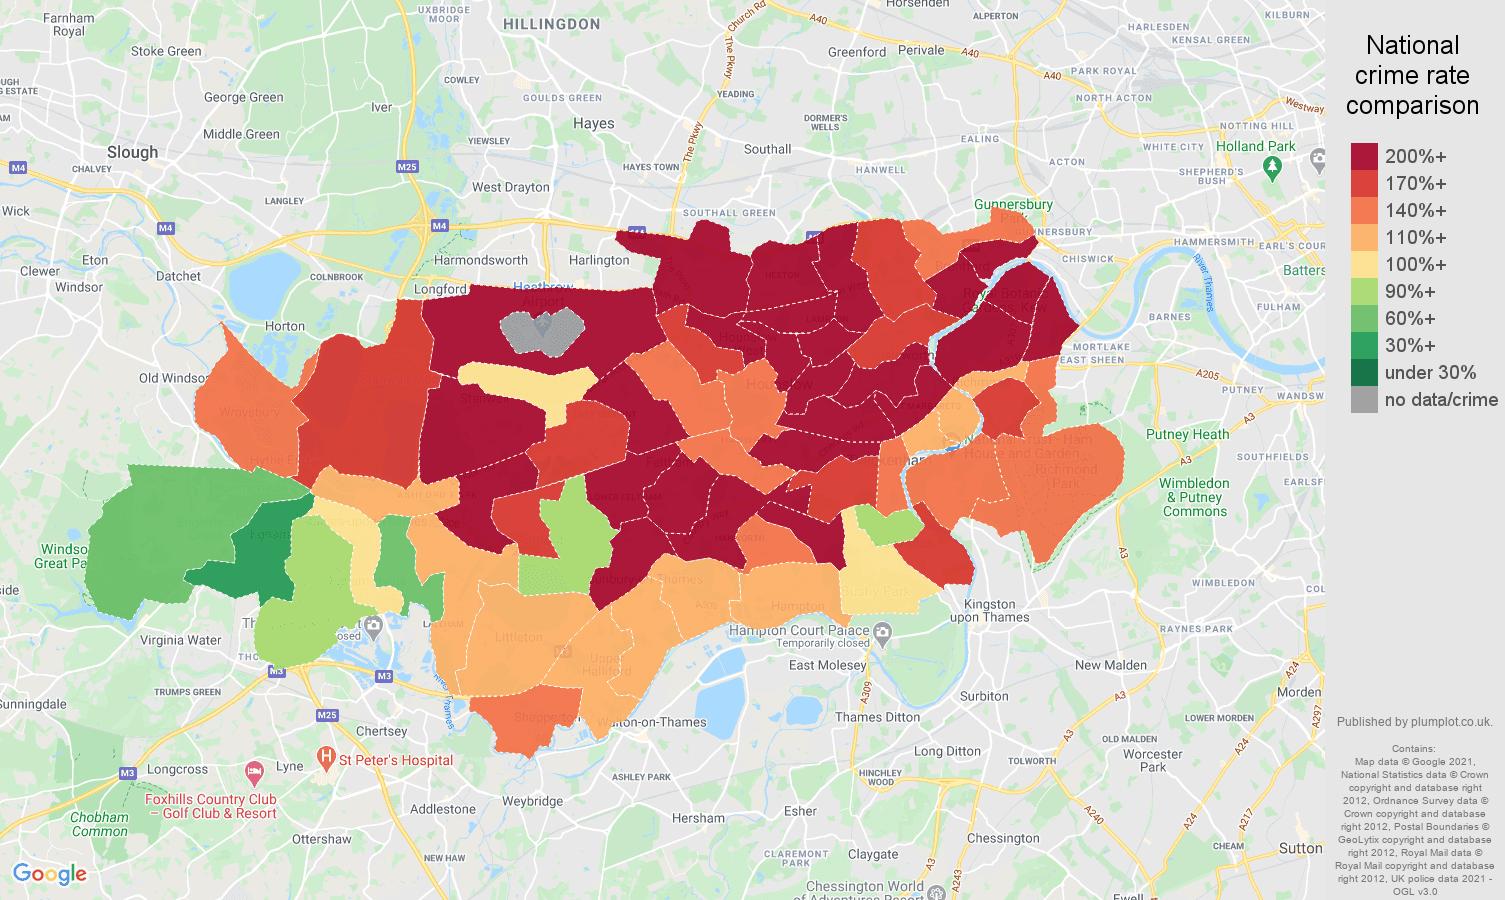 Twickenham vehicle crime rate comparison map